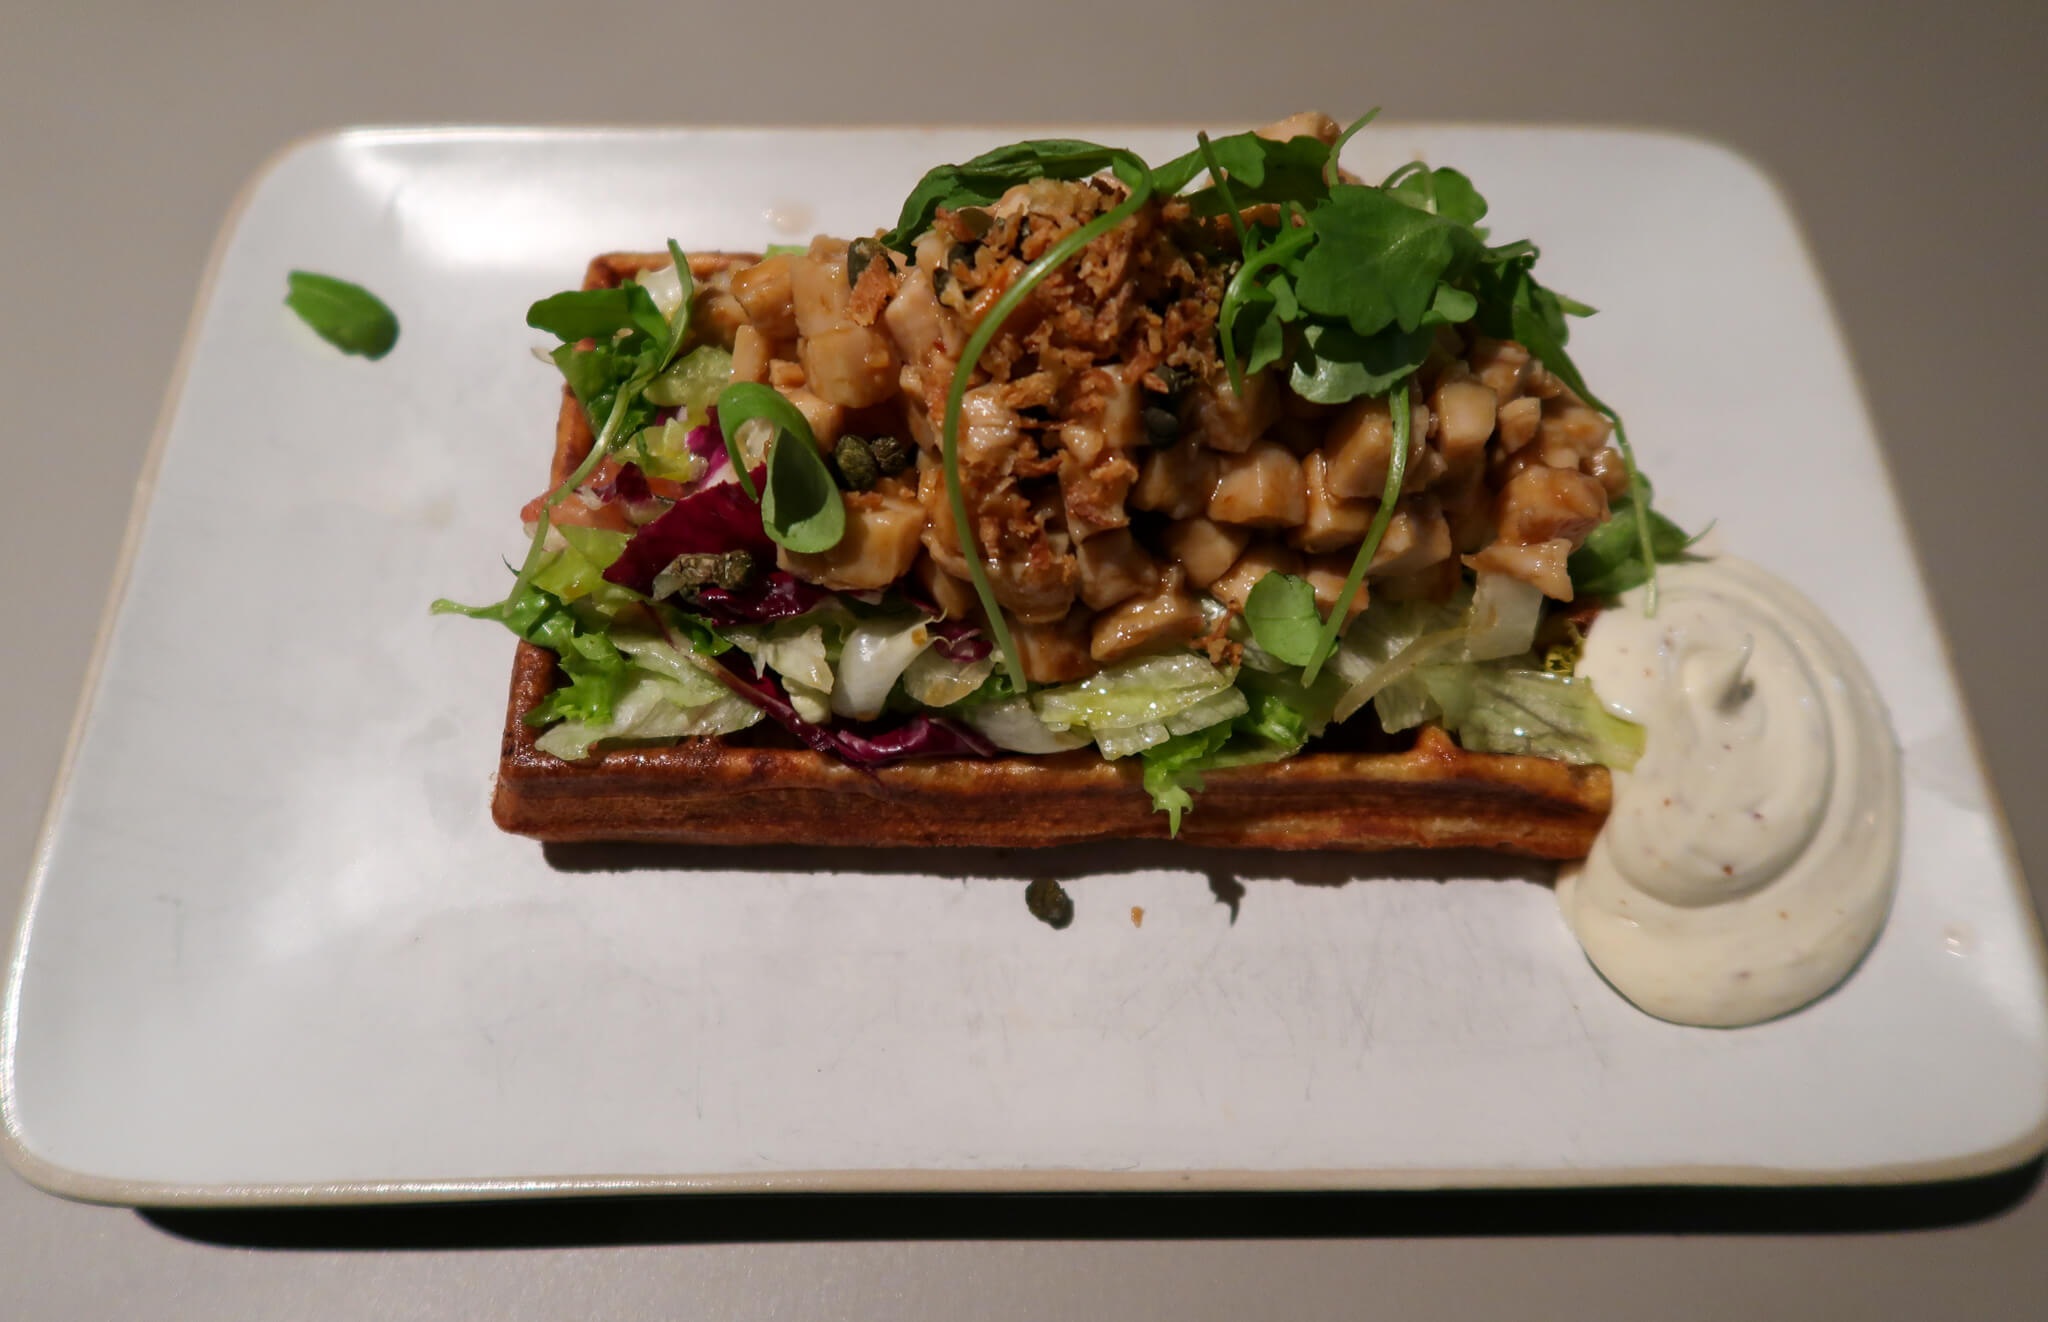 Lapland Cafe 21 Food